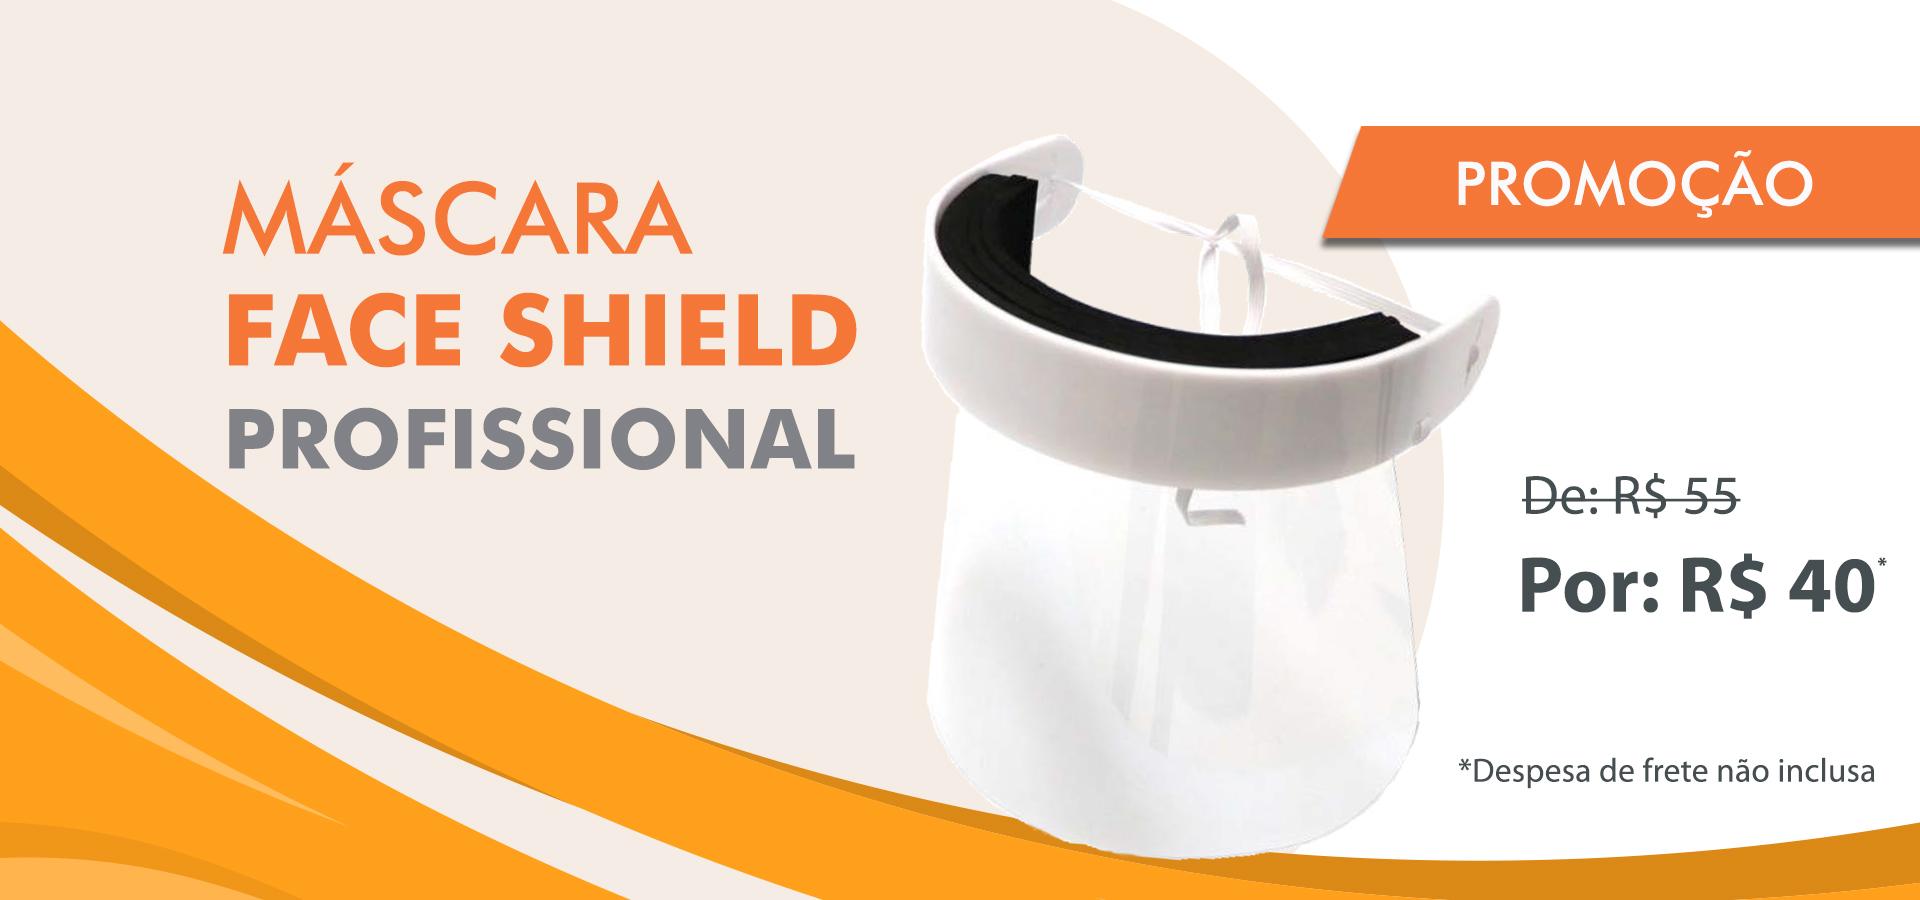 Máscara Face Shield Profissional – promoção